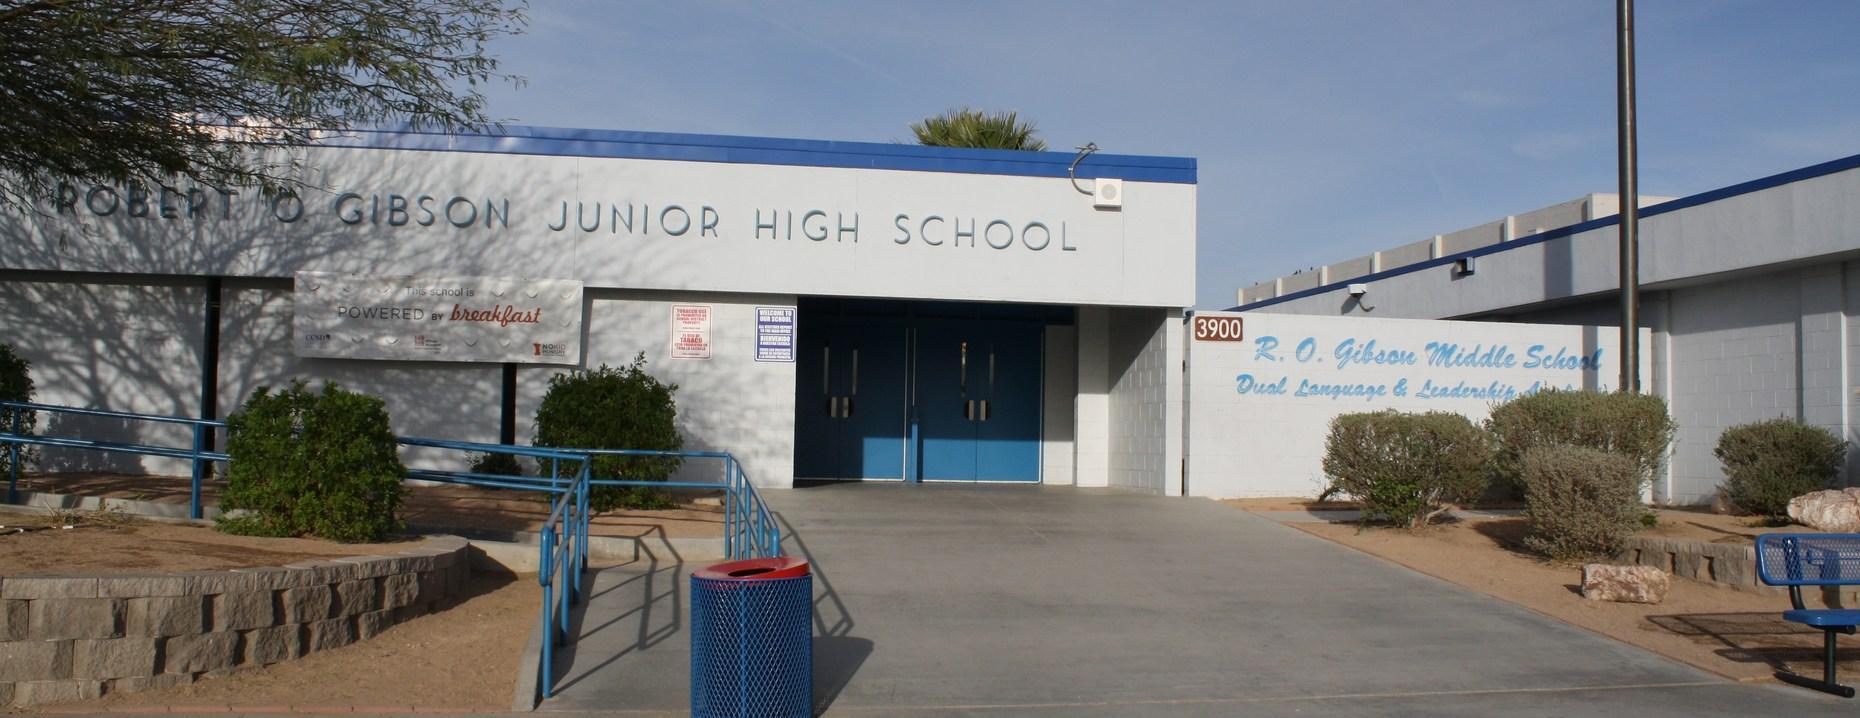 Robert O  Gibson Middle School